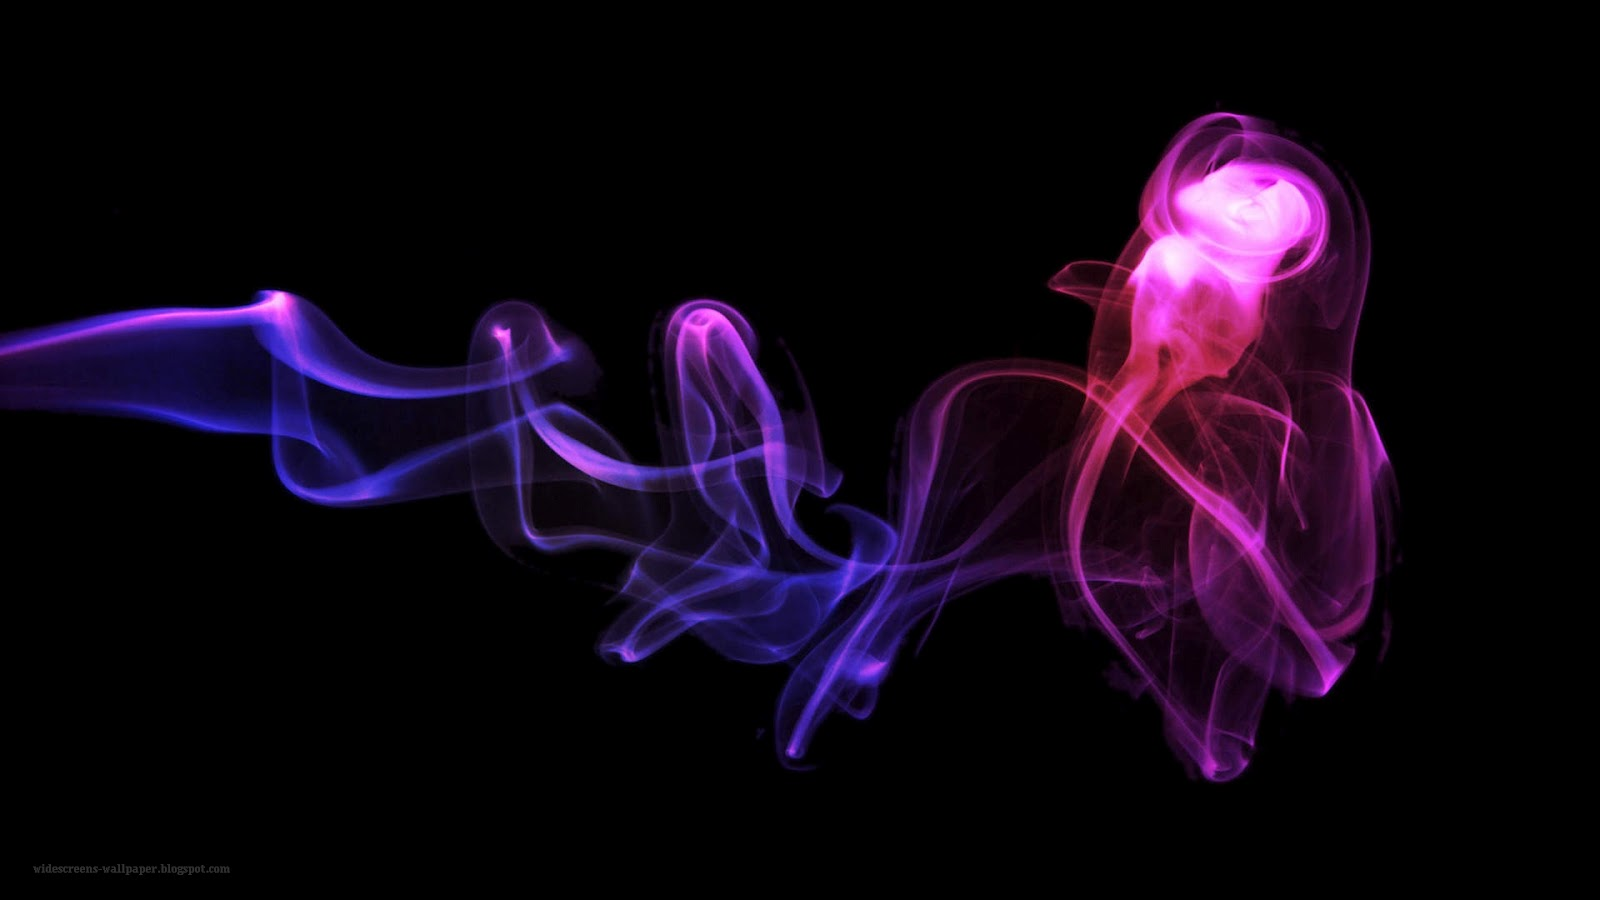 colorful smoke wallpaper designs - photo #35